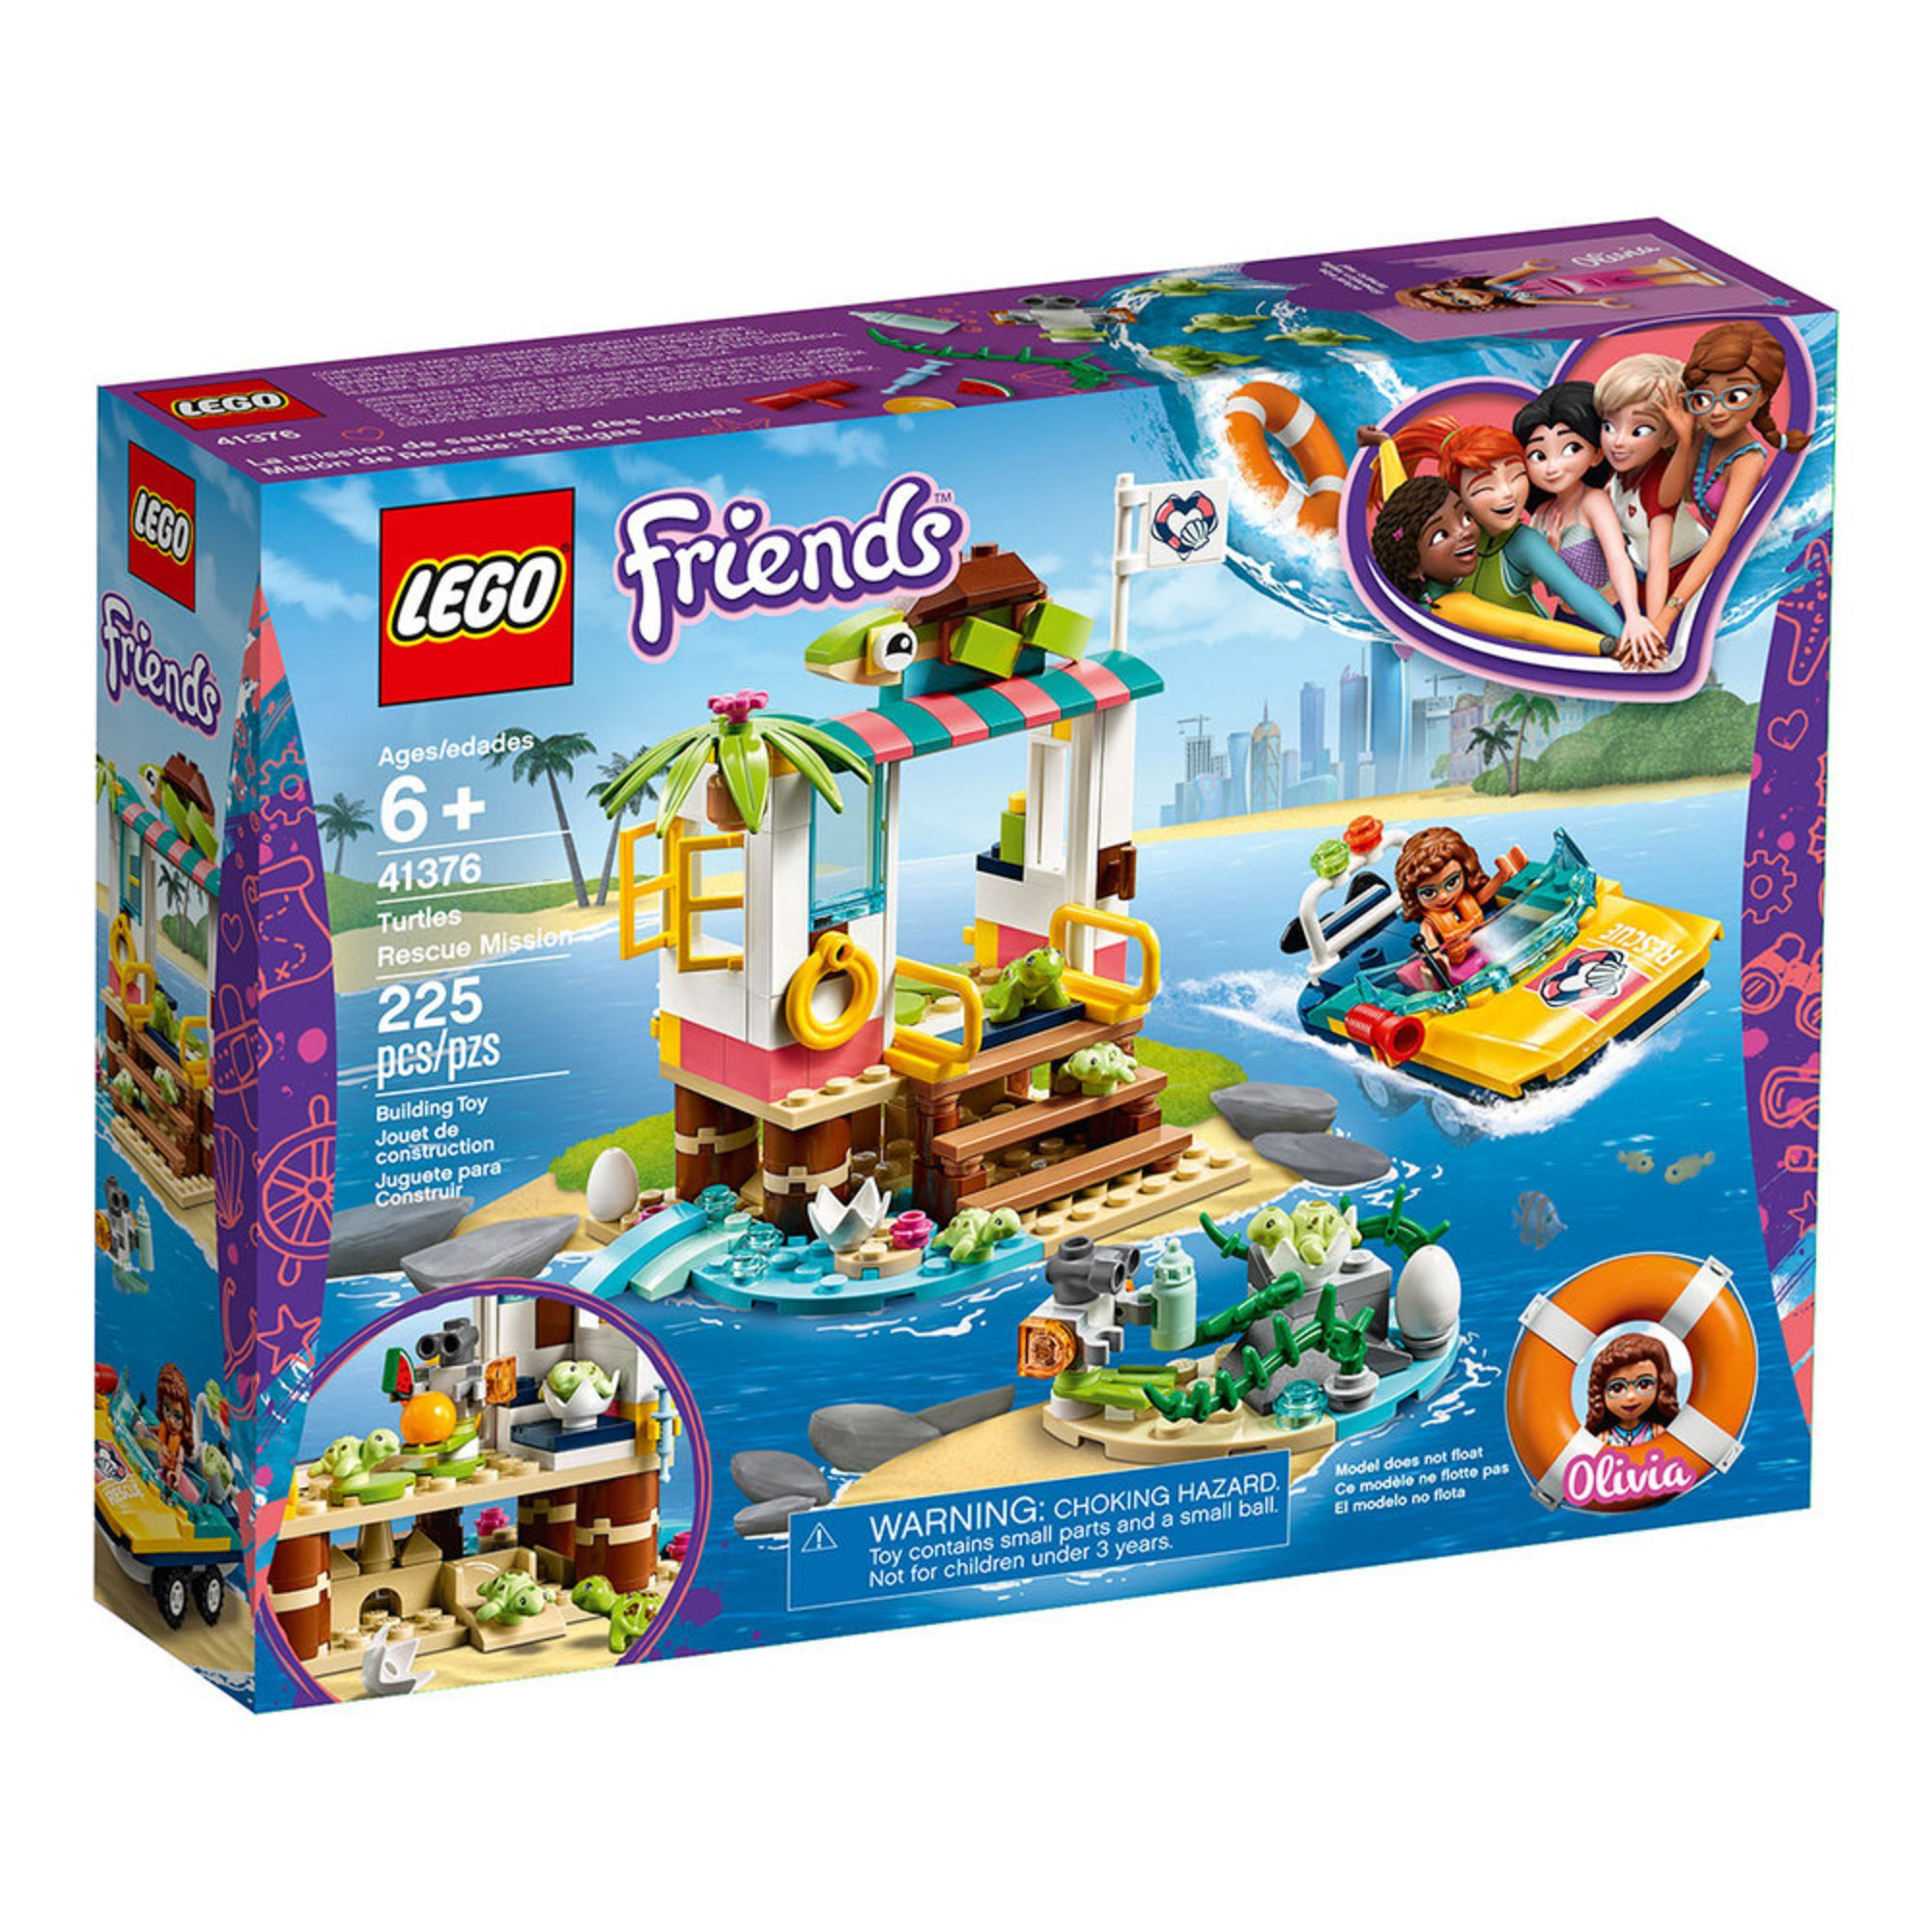 Lego Friends Turtles Rescue Mission (41376) | Building ...